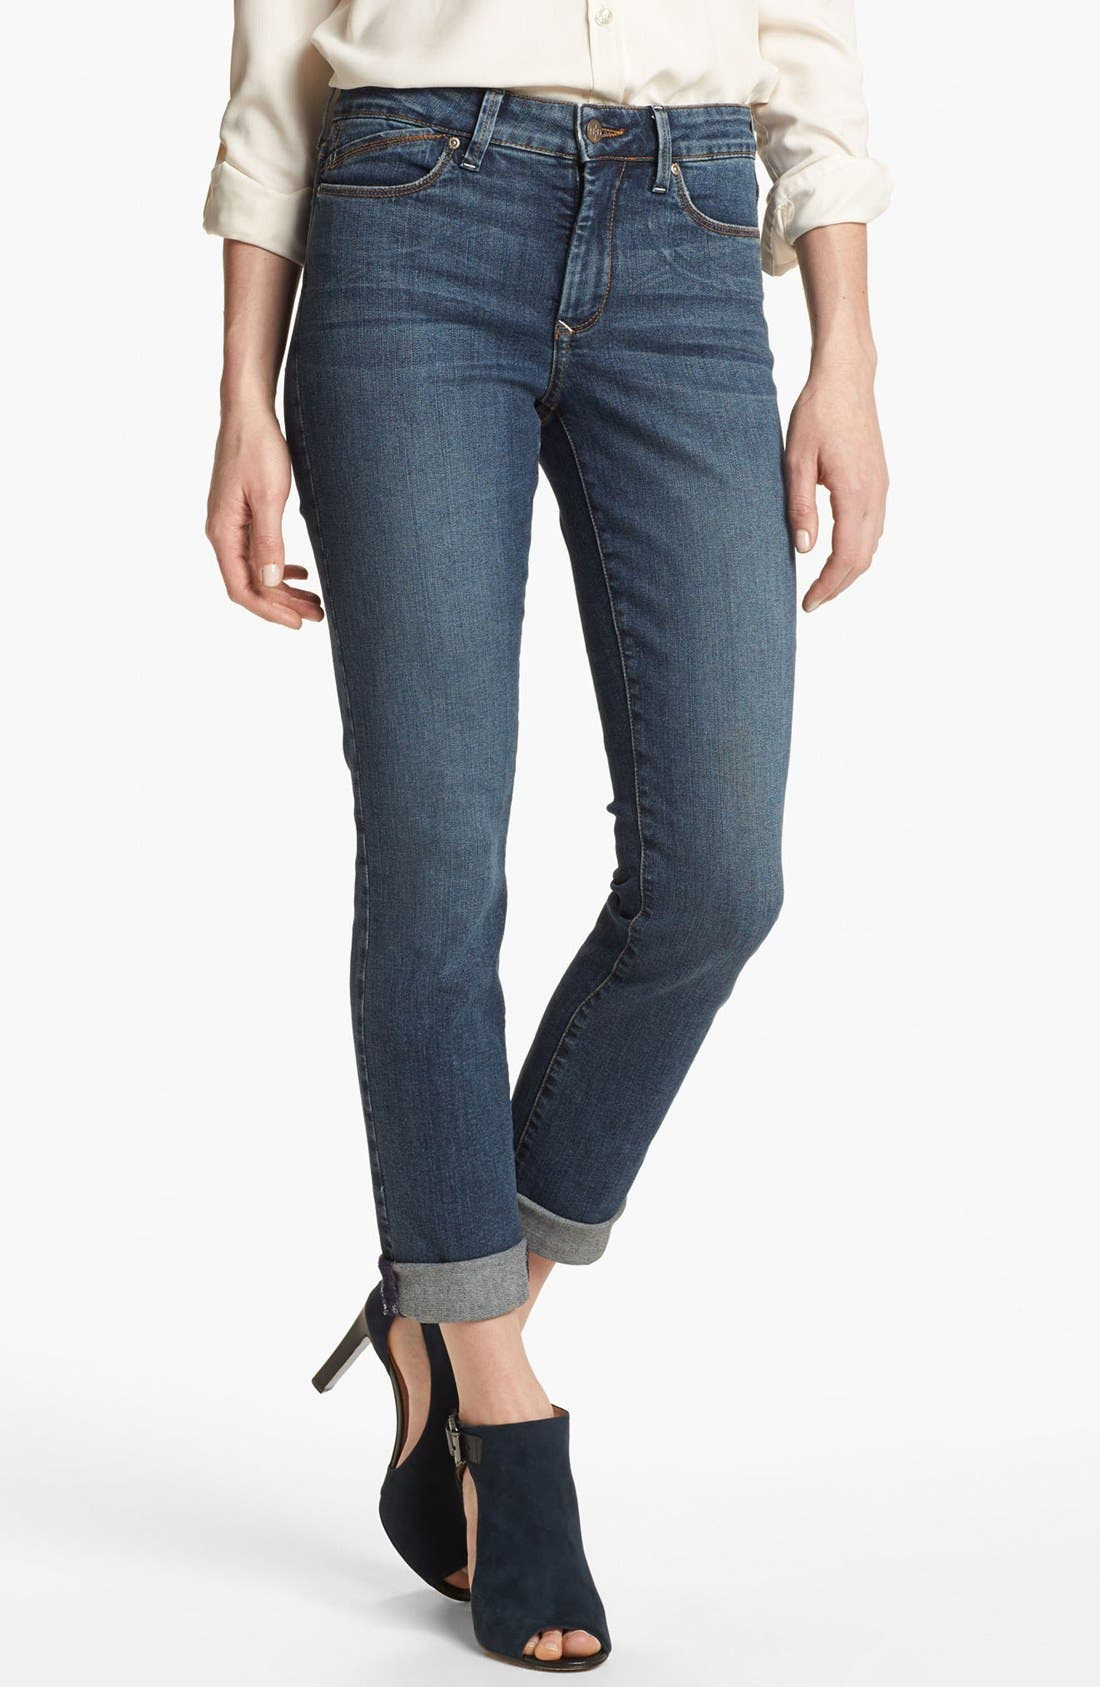 Alternate Image 1 Selected - NYDJ 'Leann' Stretch Skinny Boyfriend Jeans (Petite)